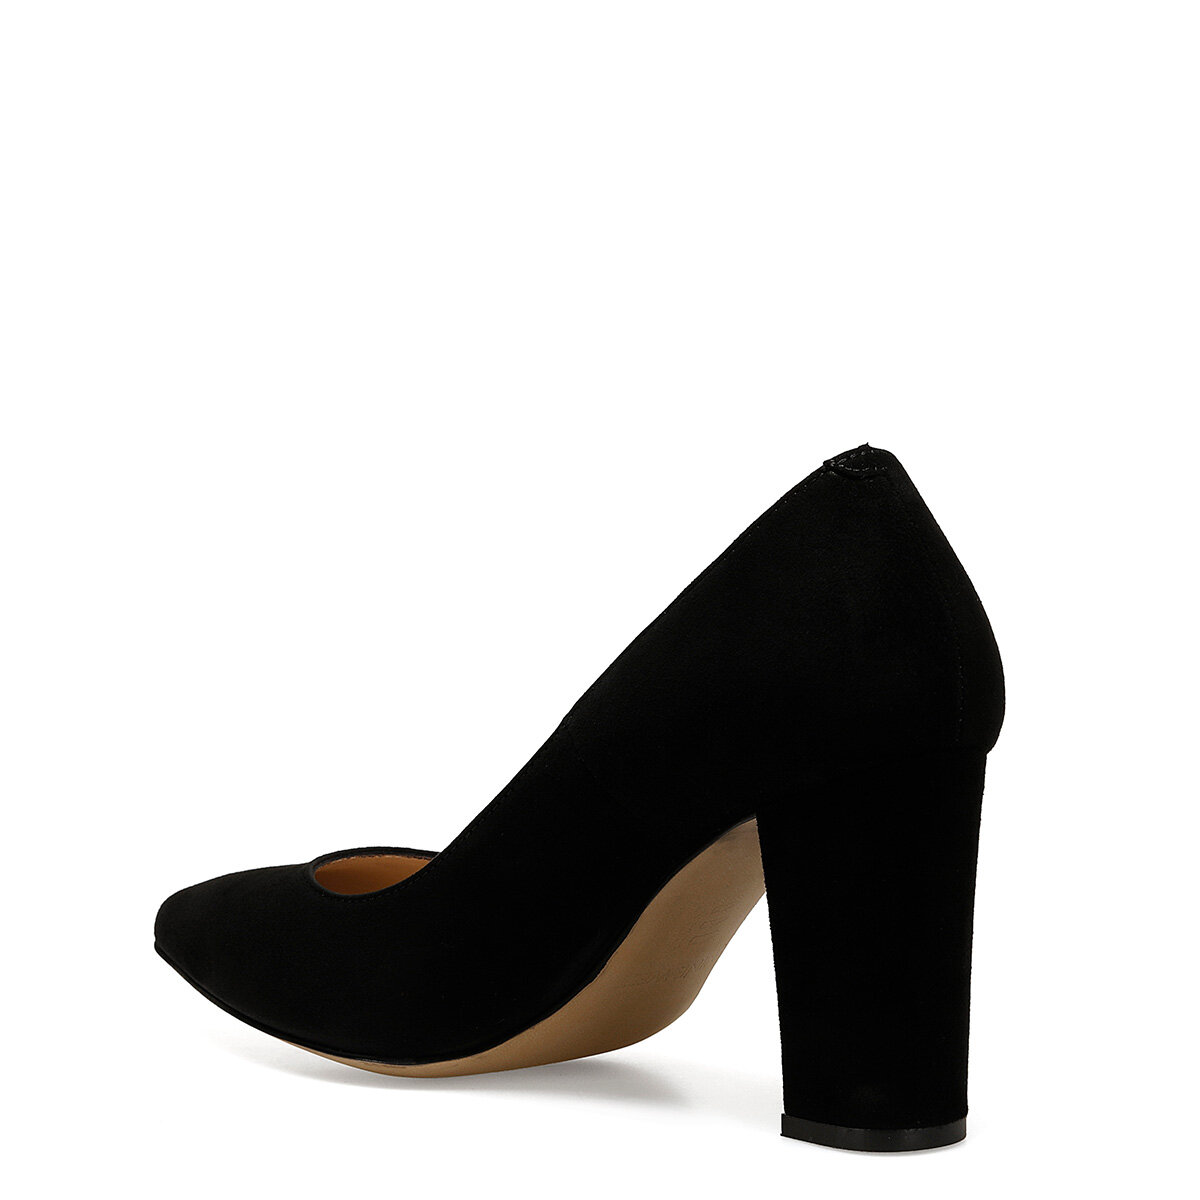 TORAS2 Siyah Kadın Topuklu Ayakkabı